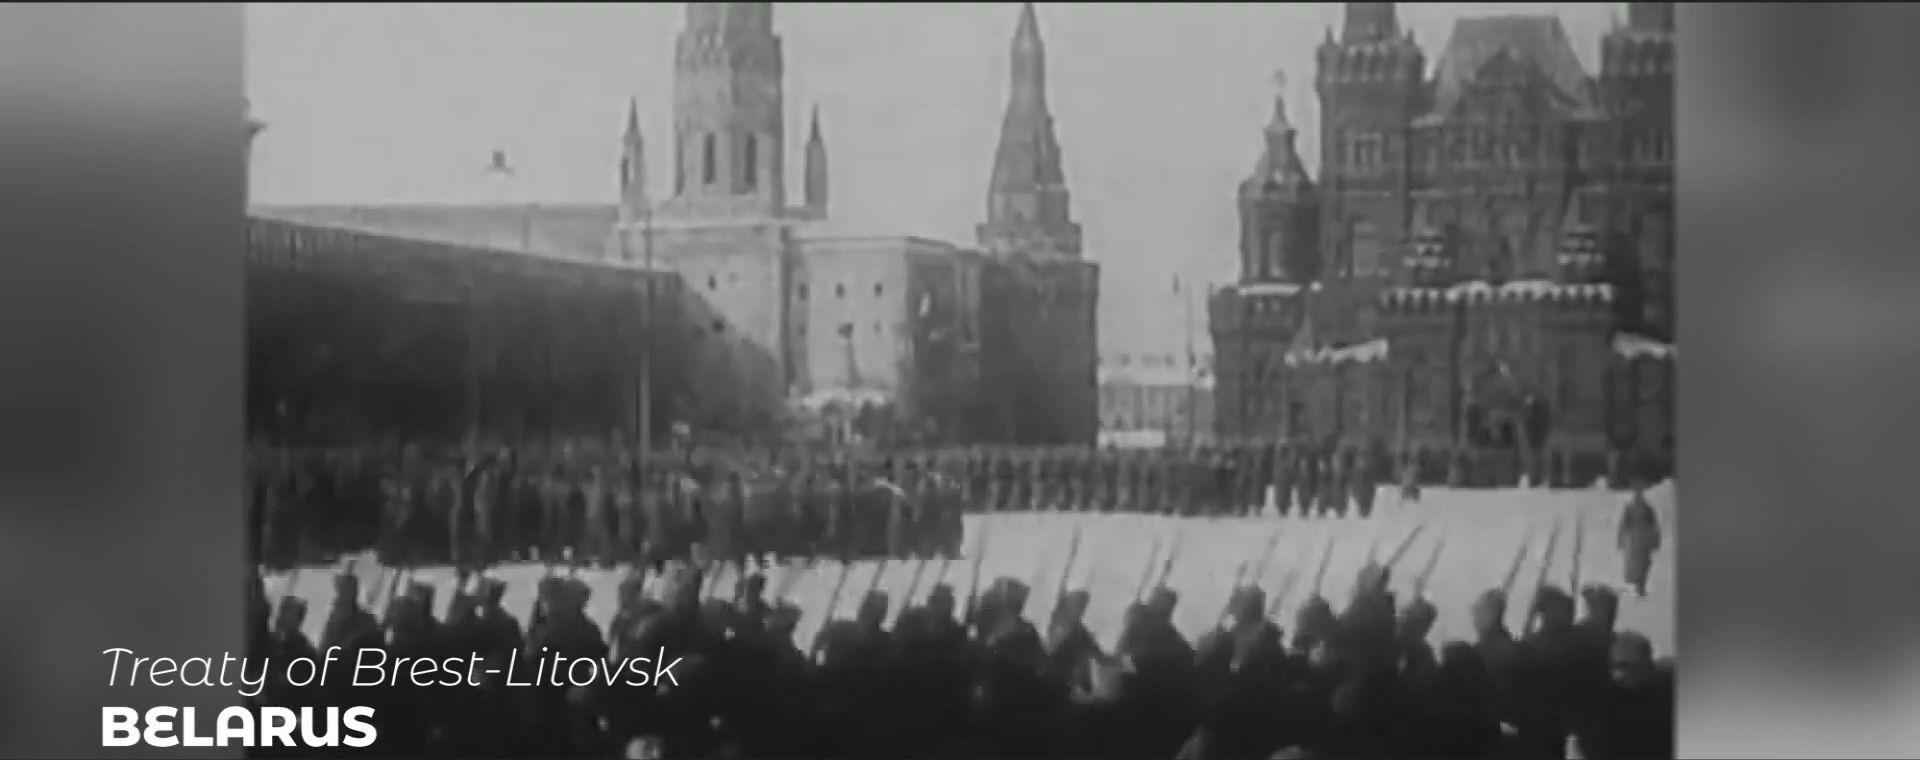 TREATY OF BRESTLITOVSK